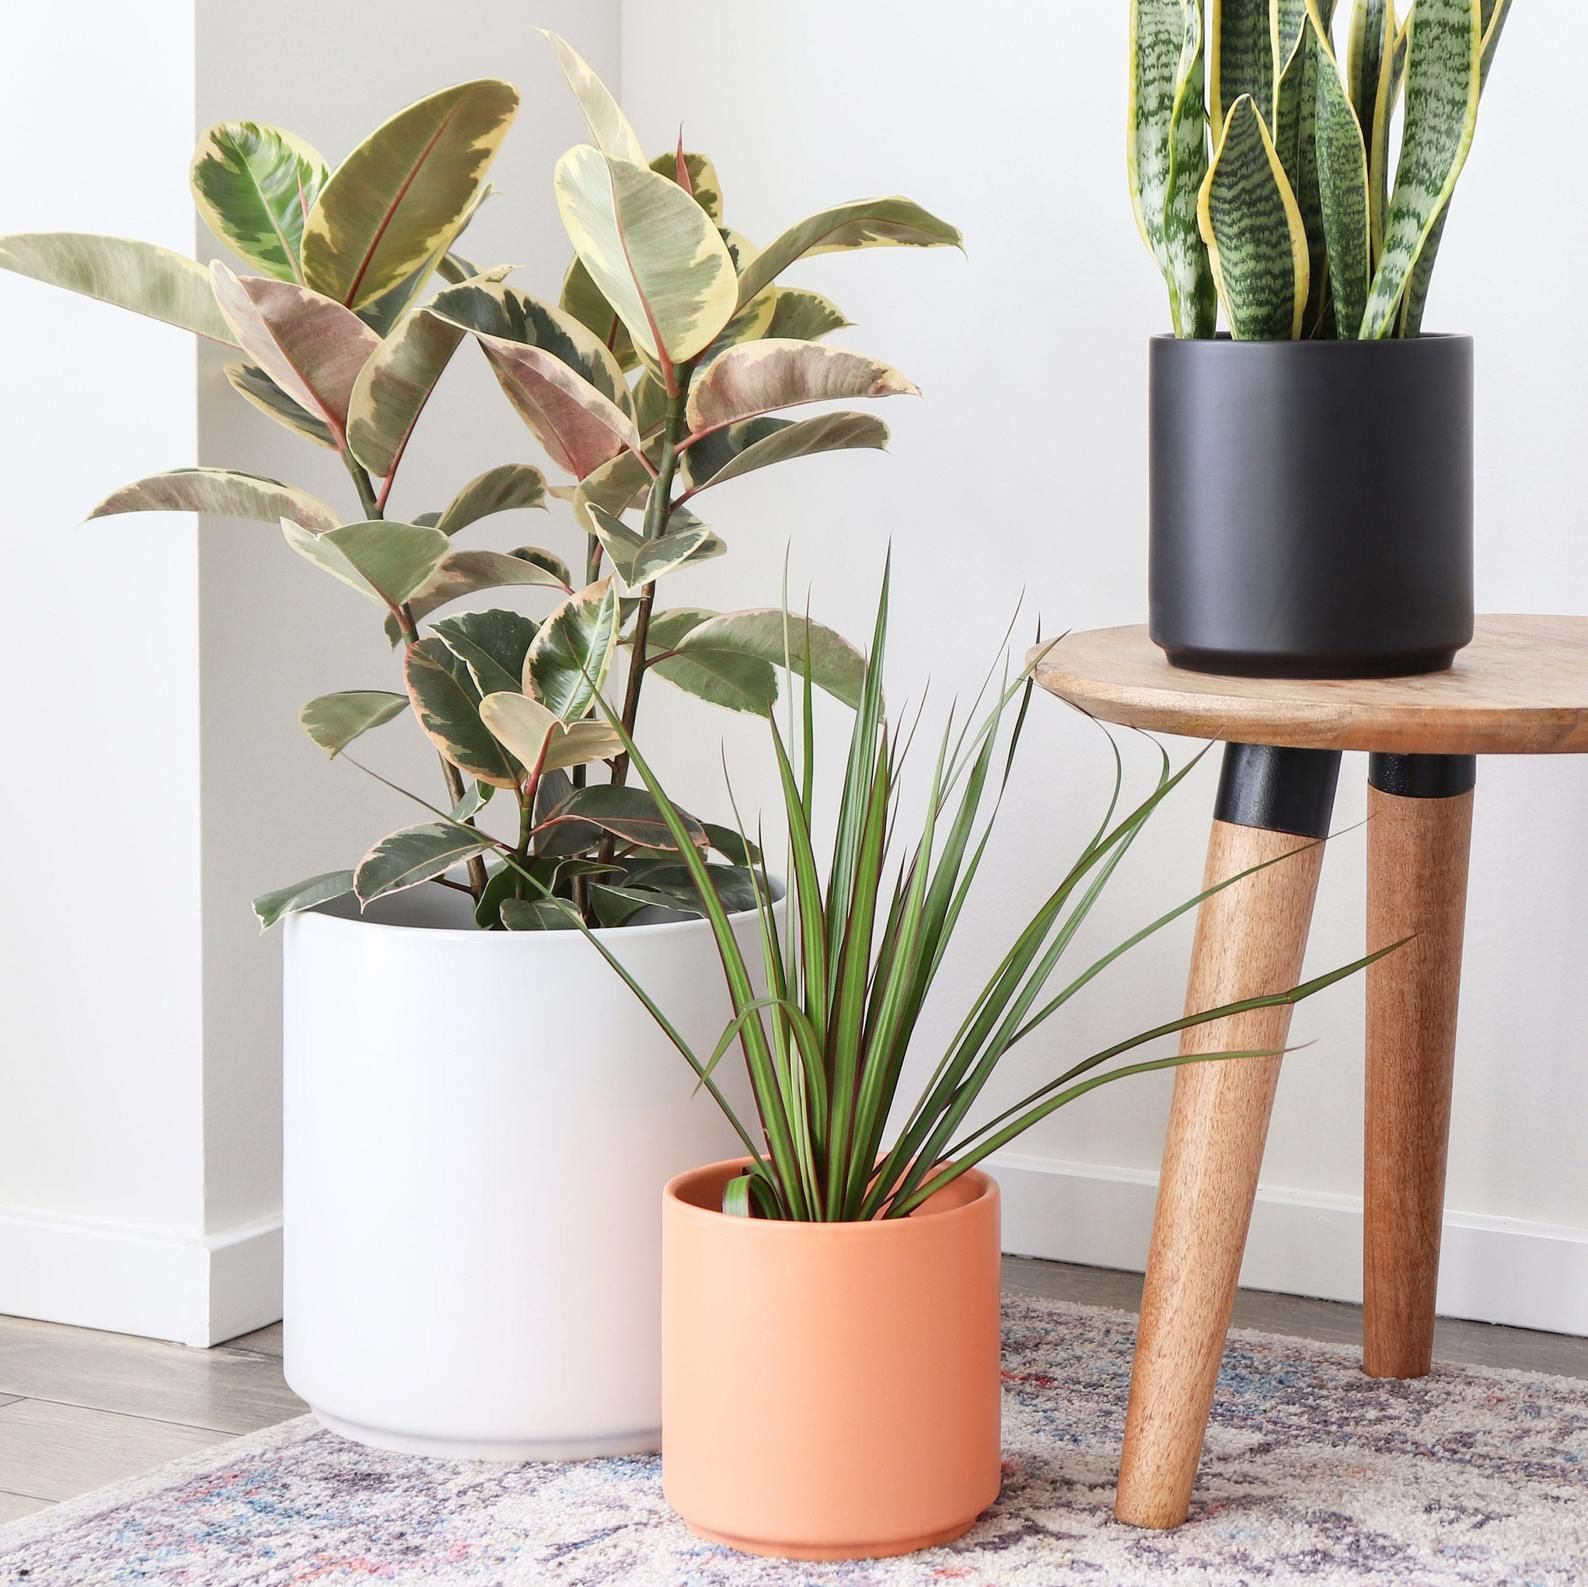 Indoor Planter Ceramic Plant Pot 12 10 Etsy In 2020 Large Flower Pots Ceramic Plant Pots Indoor Planters